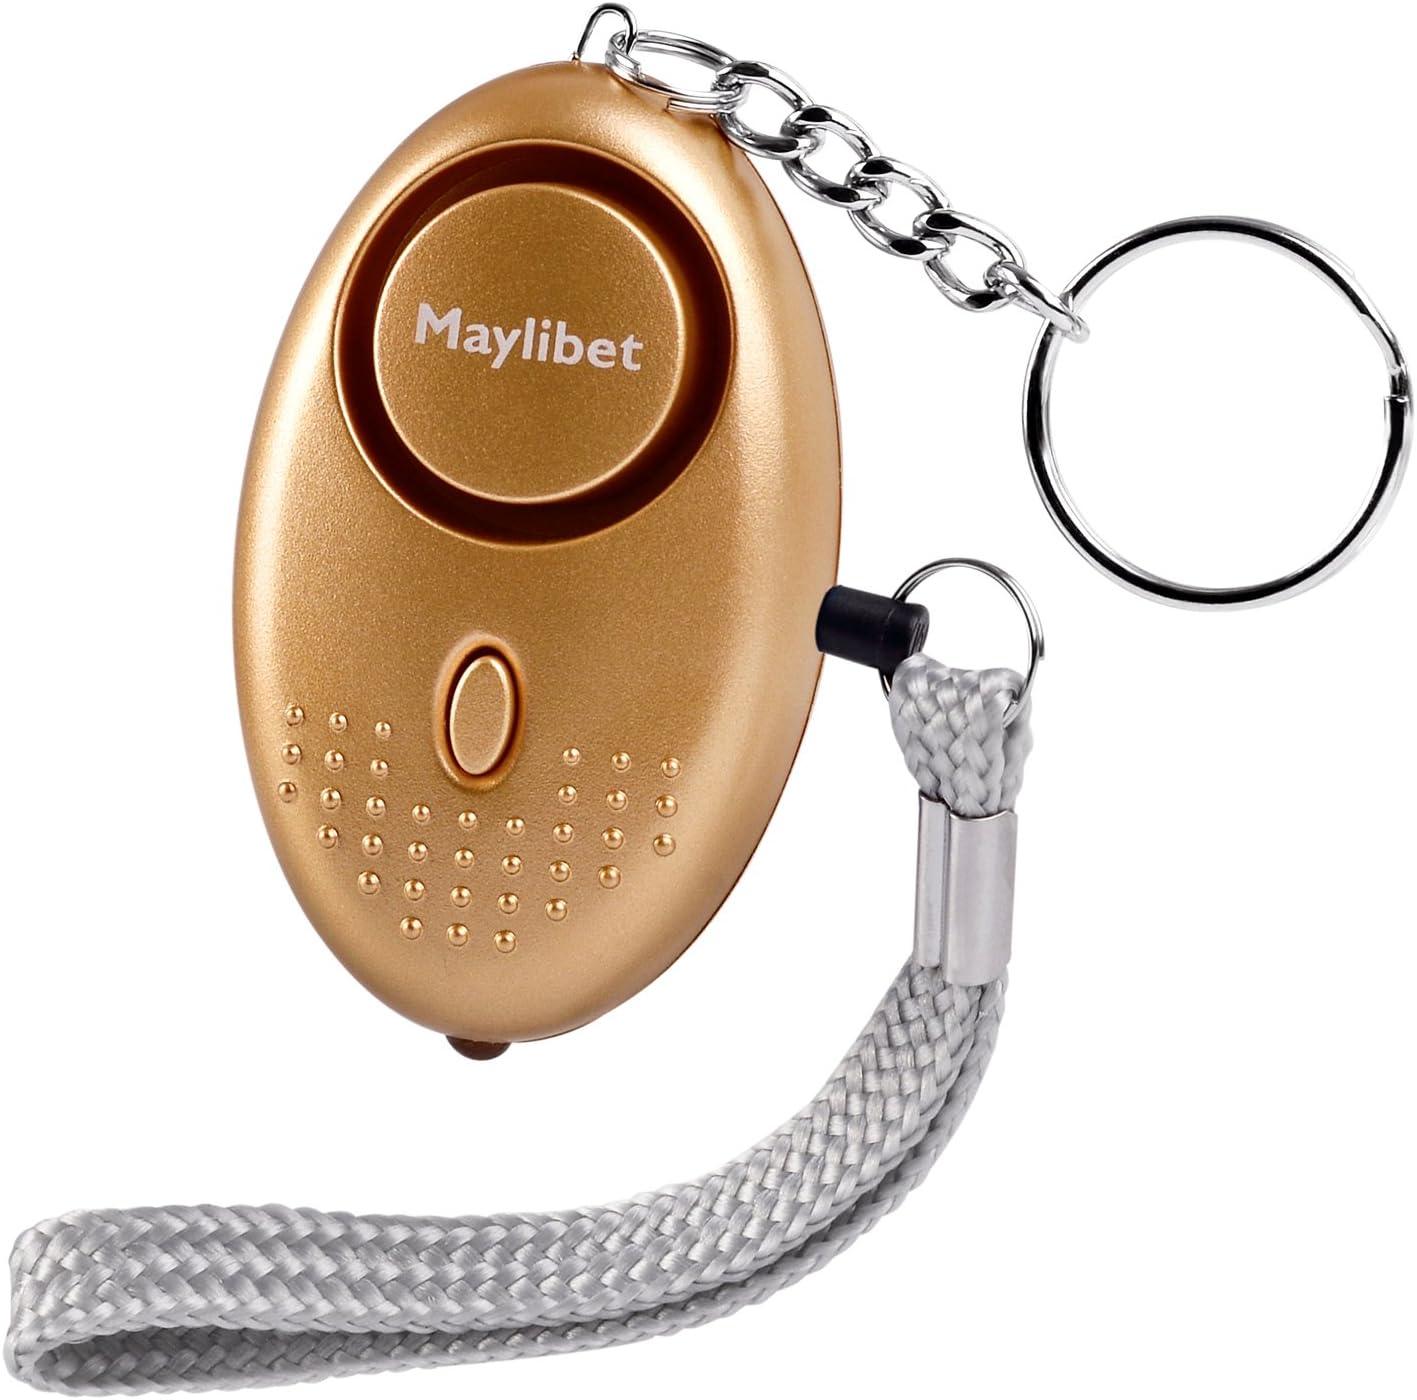 Electronics Security & Surveillance SafeSound Personal Alarm 140dB ...